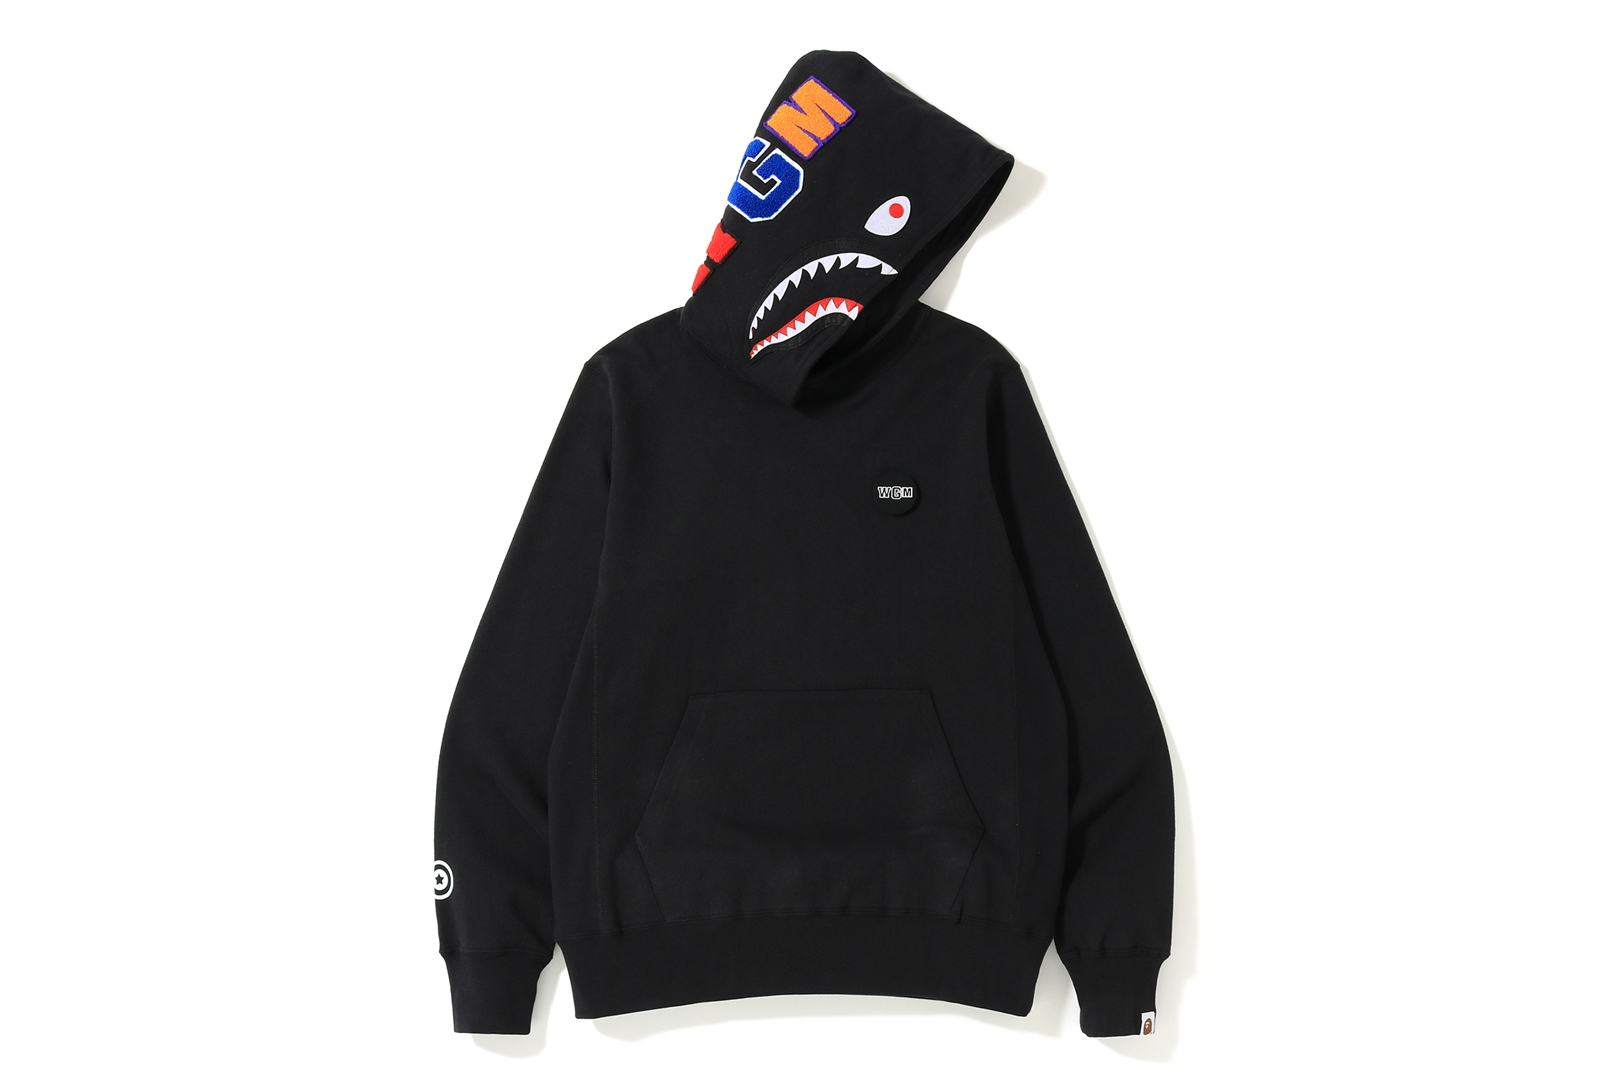 BAPE Shark Emblem Pullover Hoodie Black